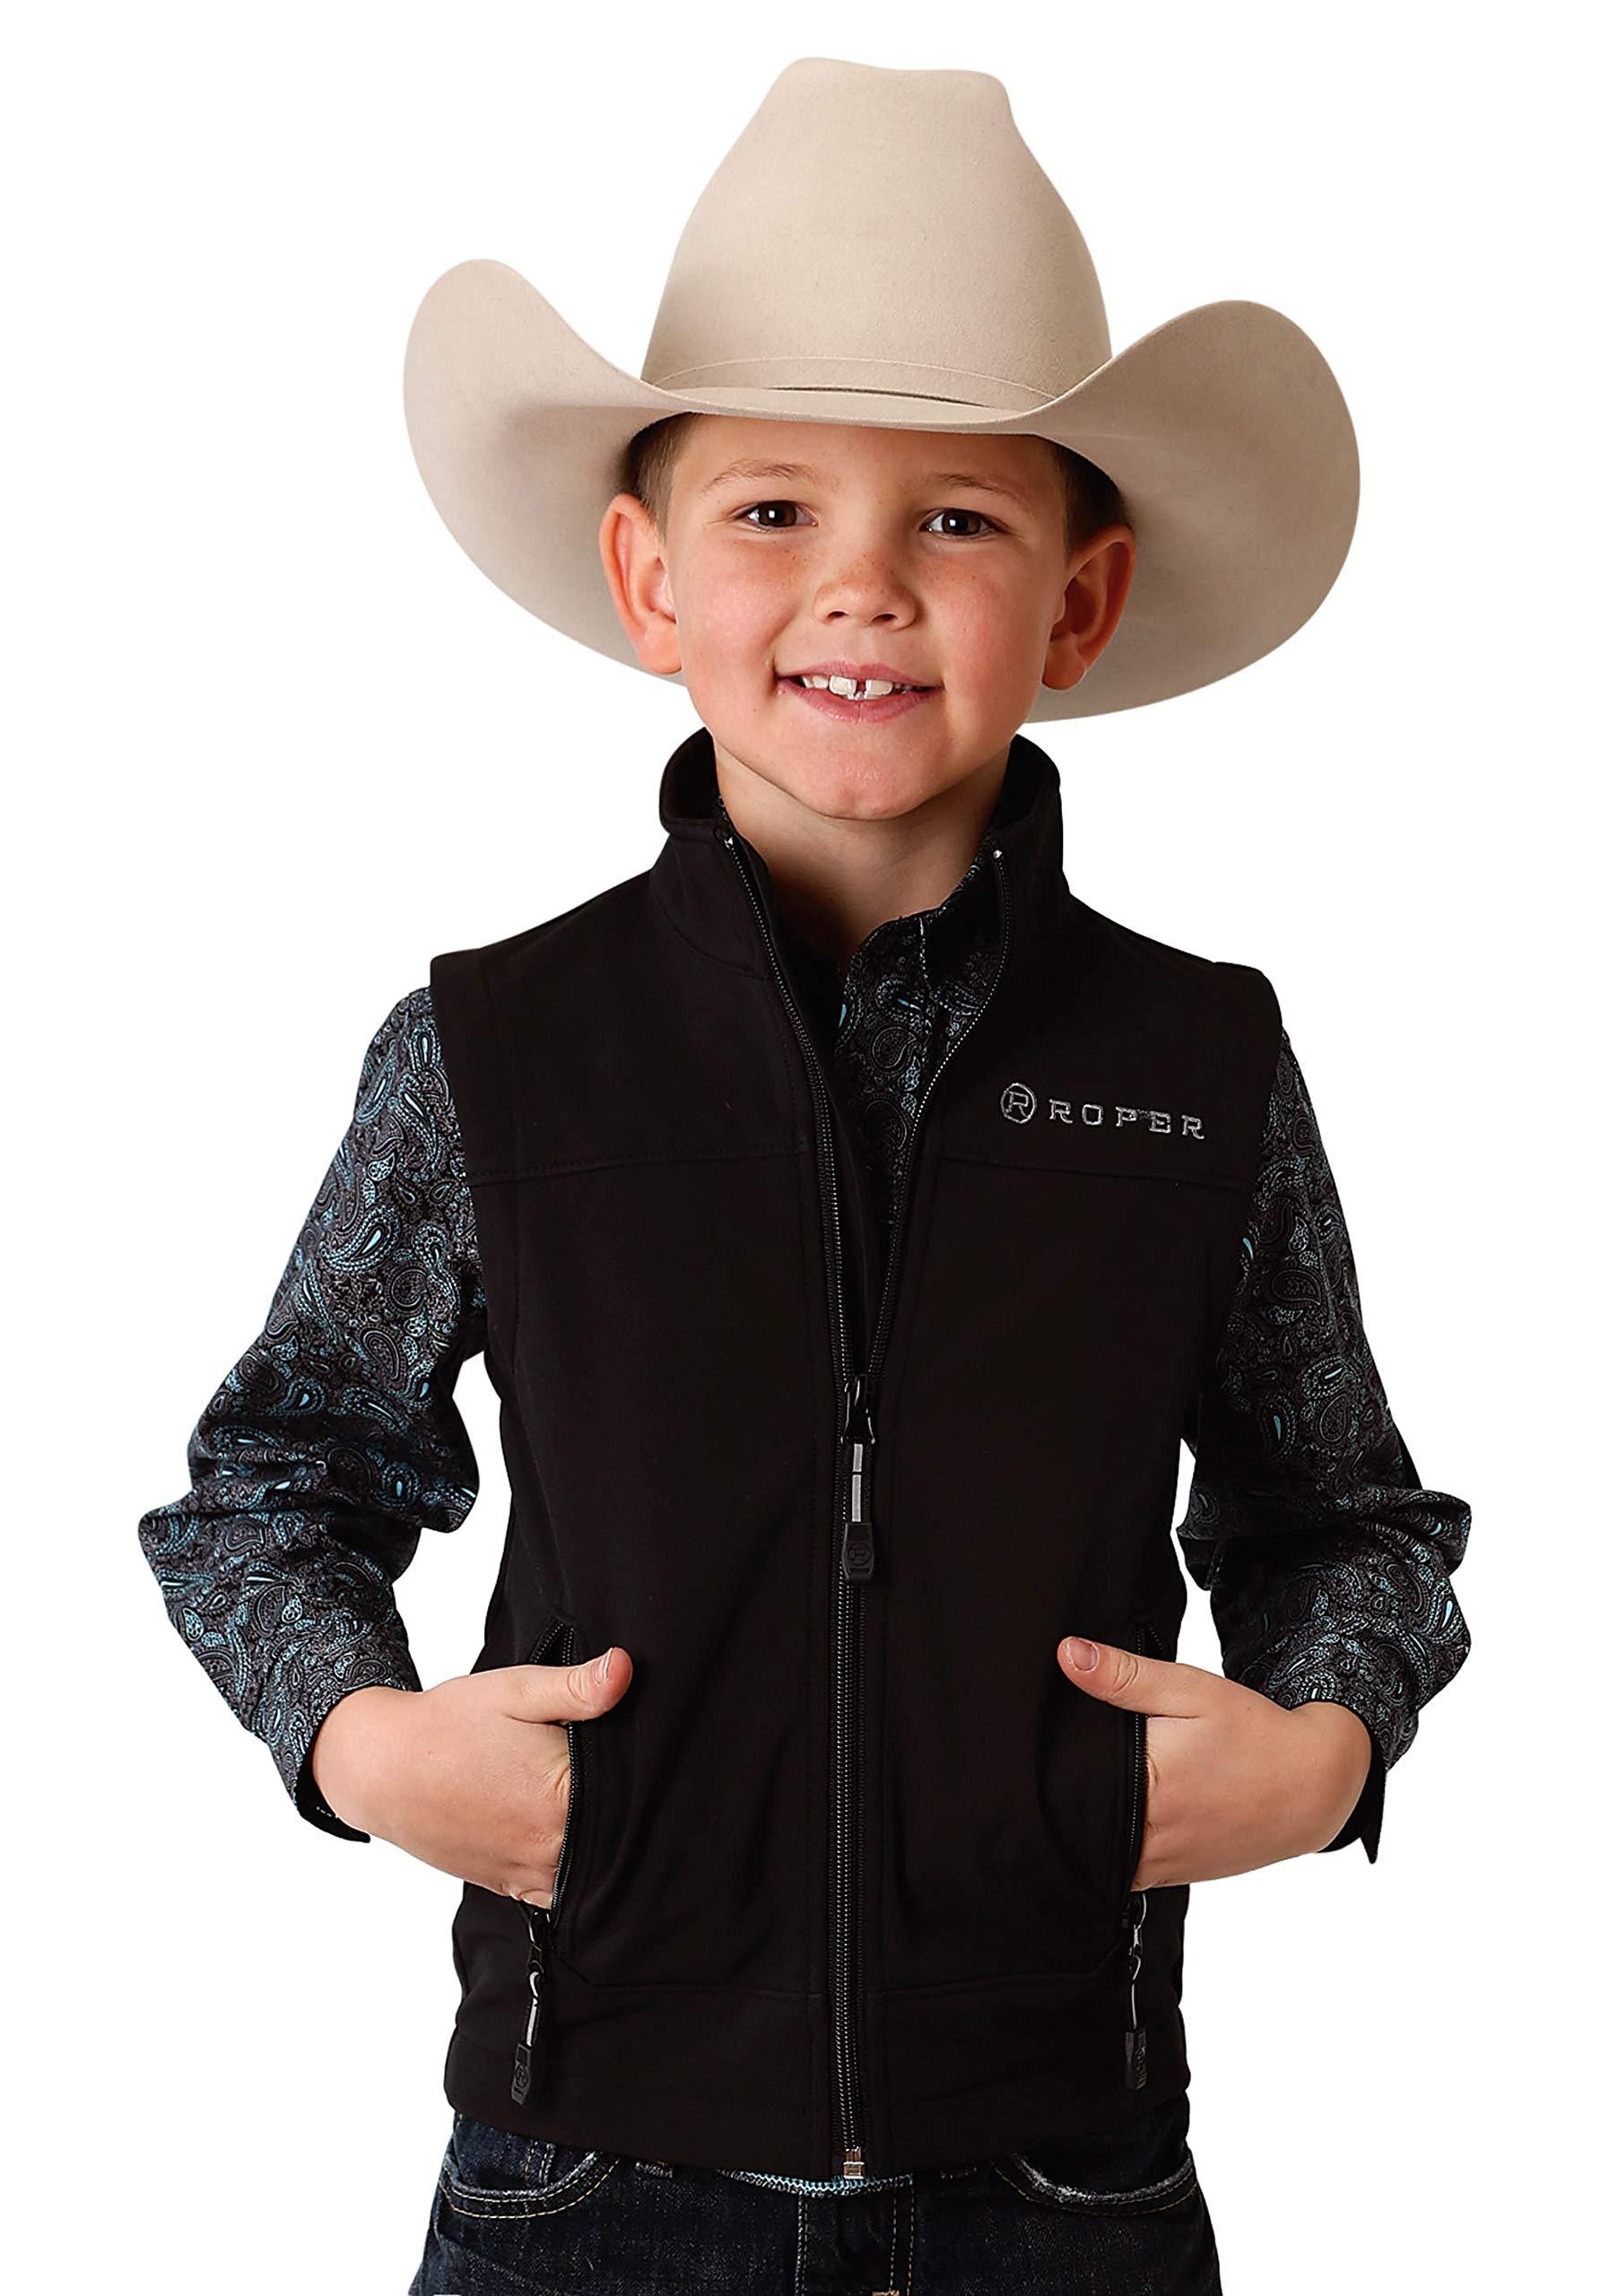 Roper Boys' Outerwear Vest 0782-7004, Black - X-Large by Roper